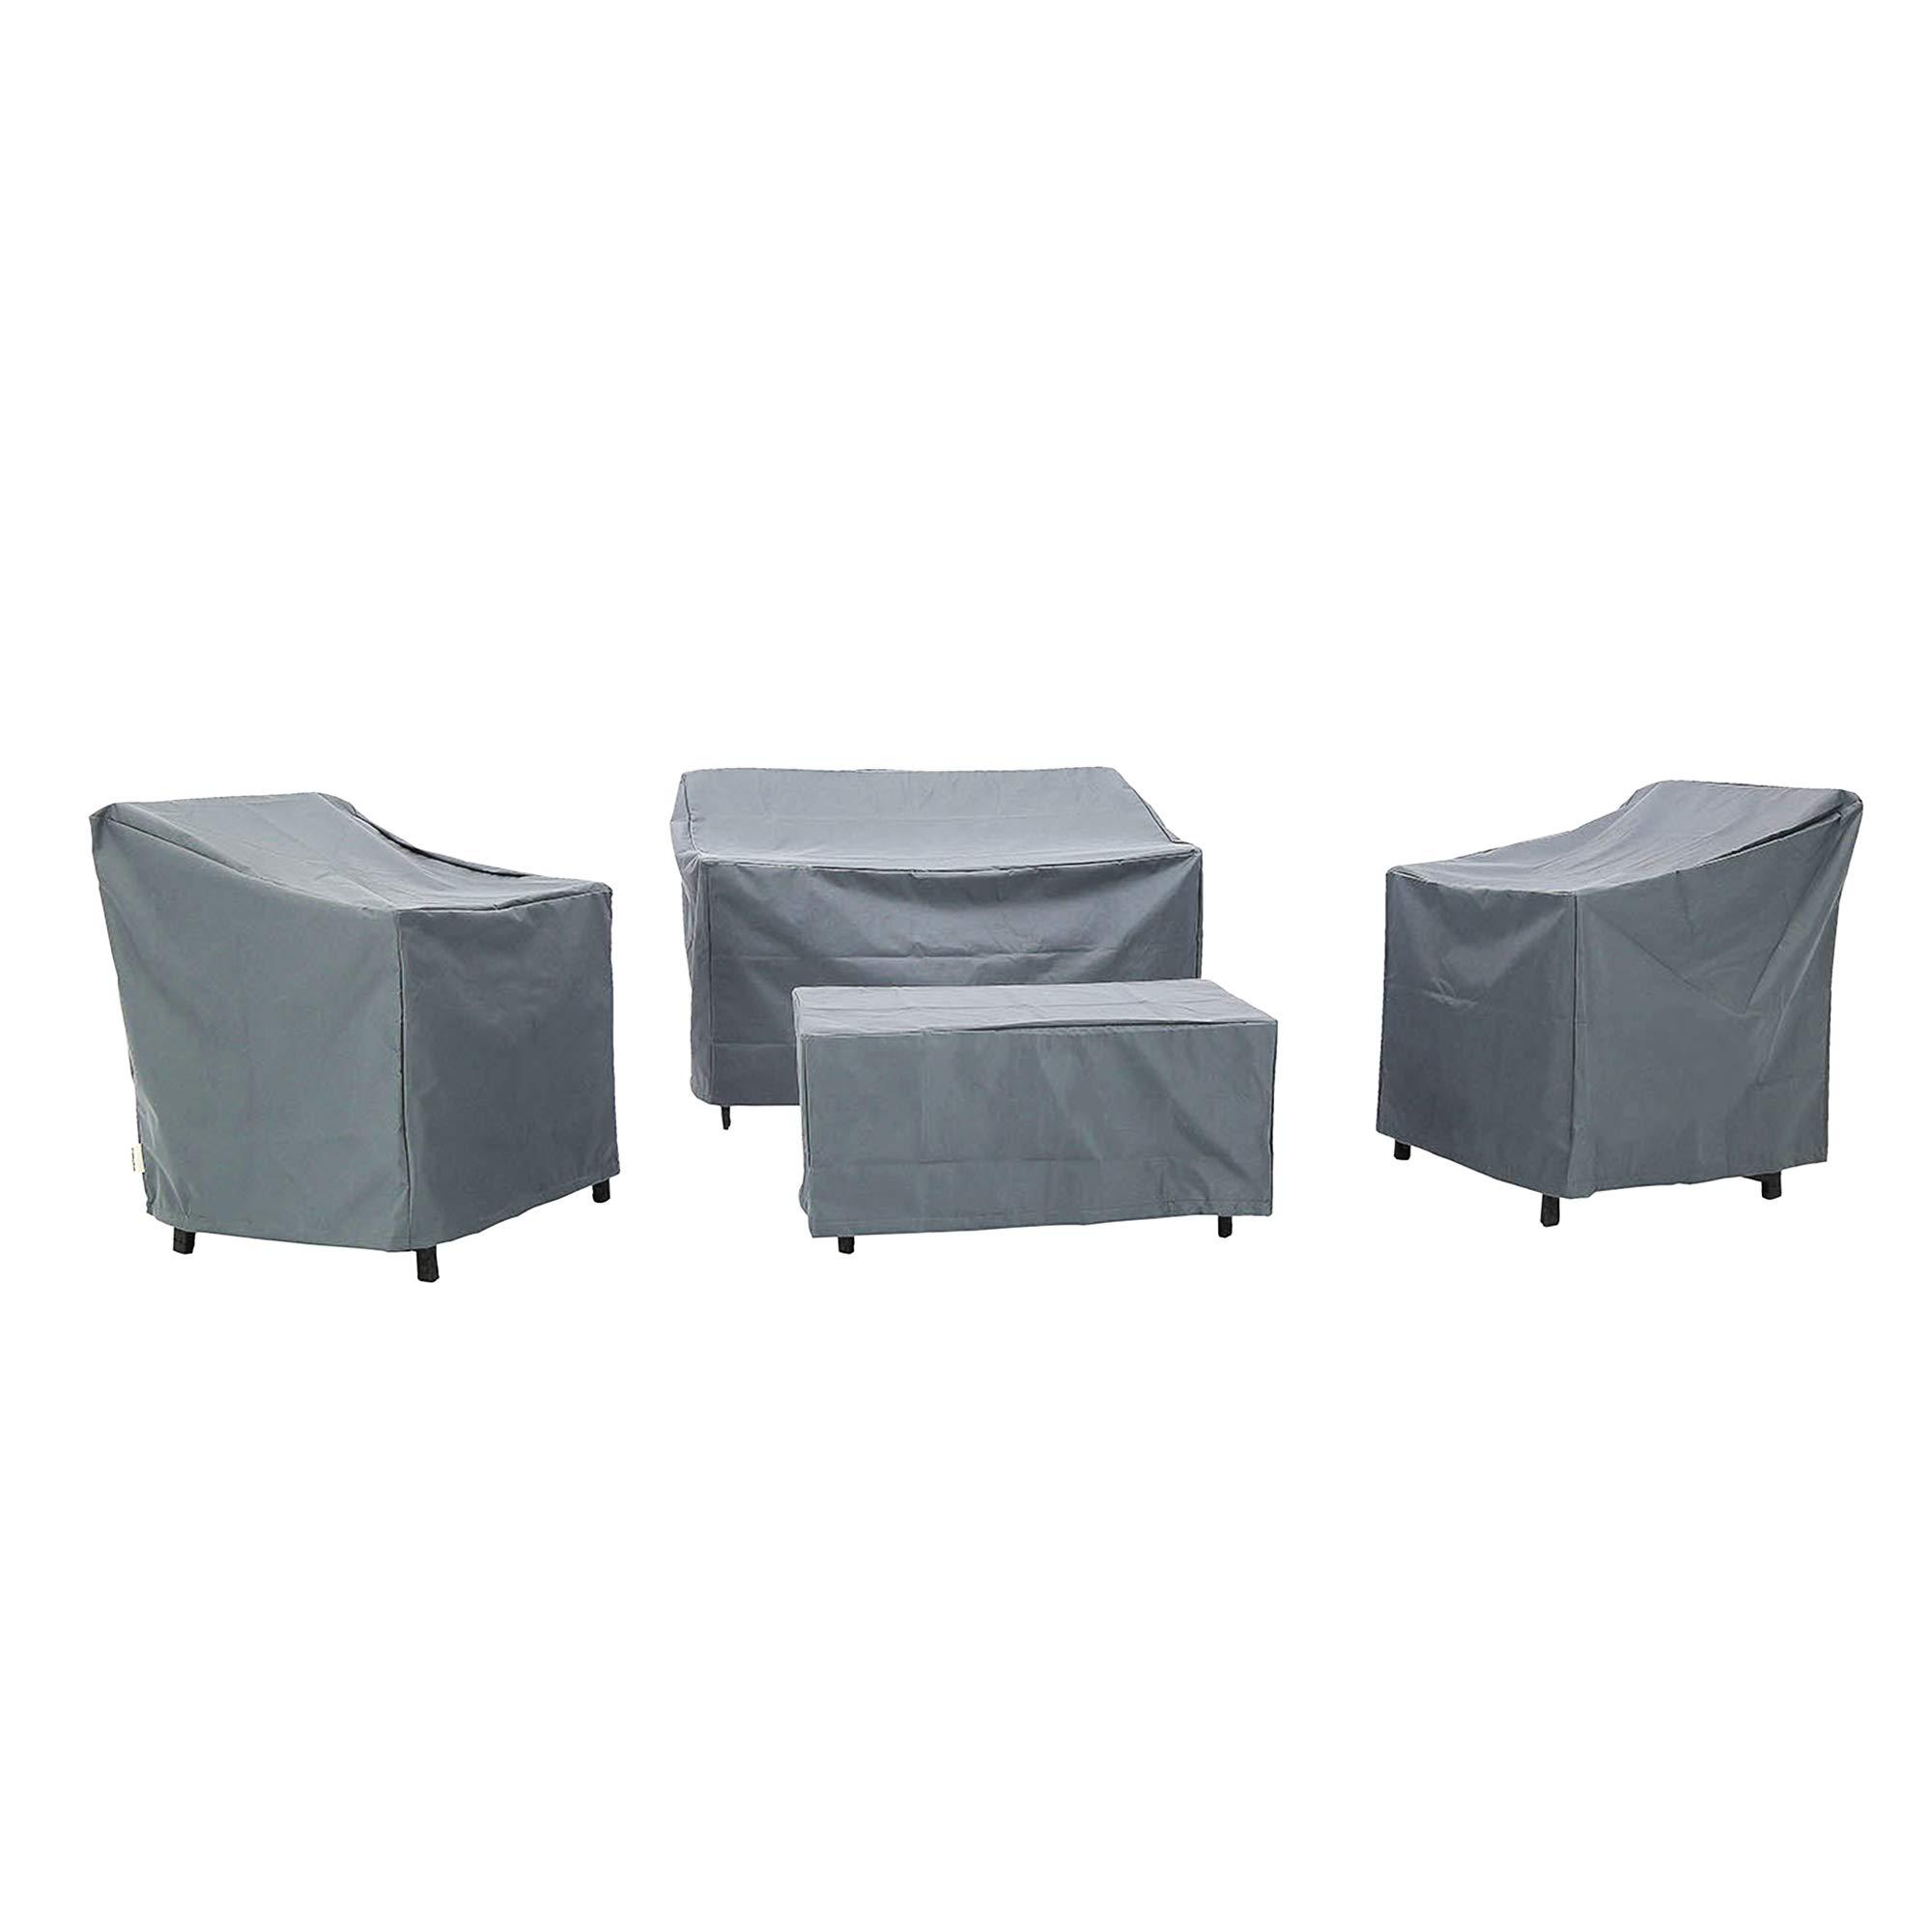 Baner Garden N82 4-Piece Outdoor Veranda Patio Garden Furniture Cover Set with Durable and Water Resistant Fabric